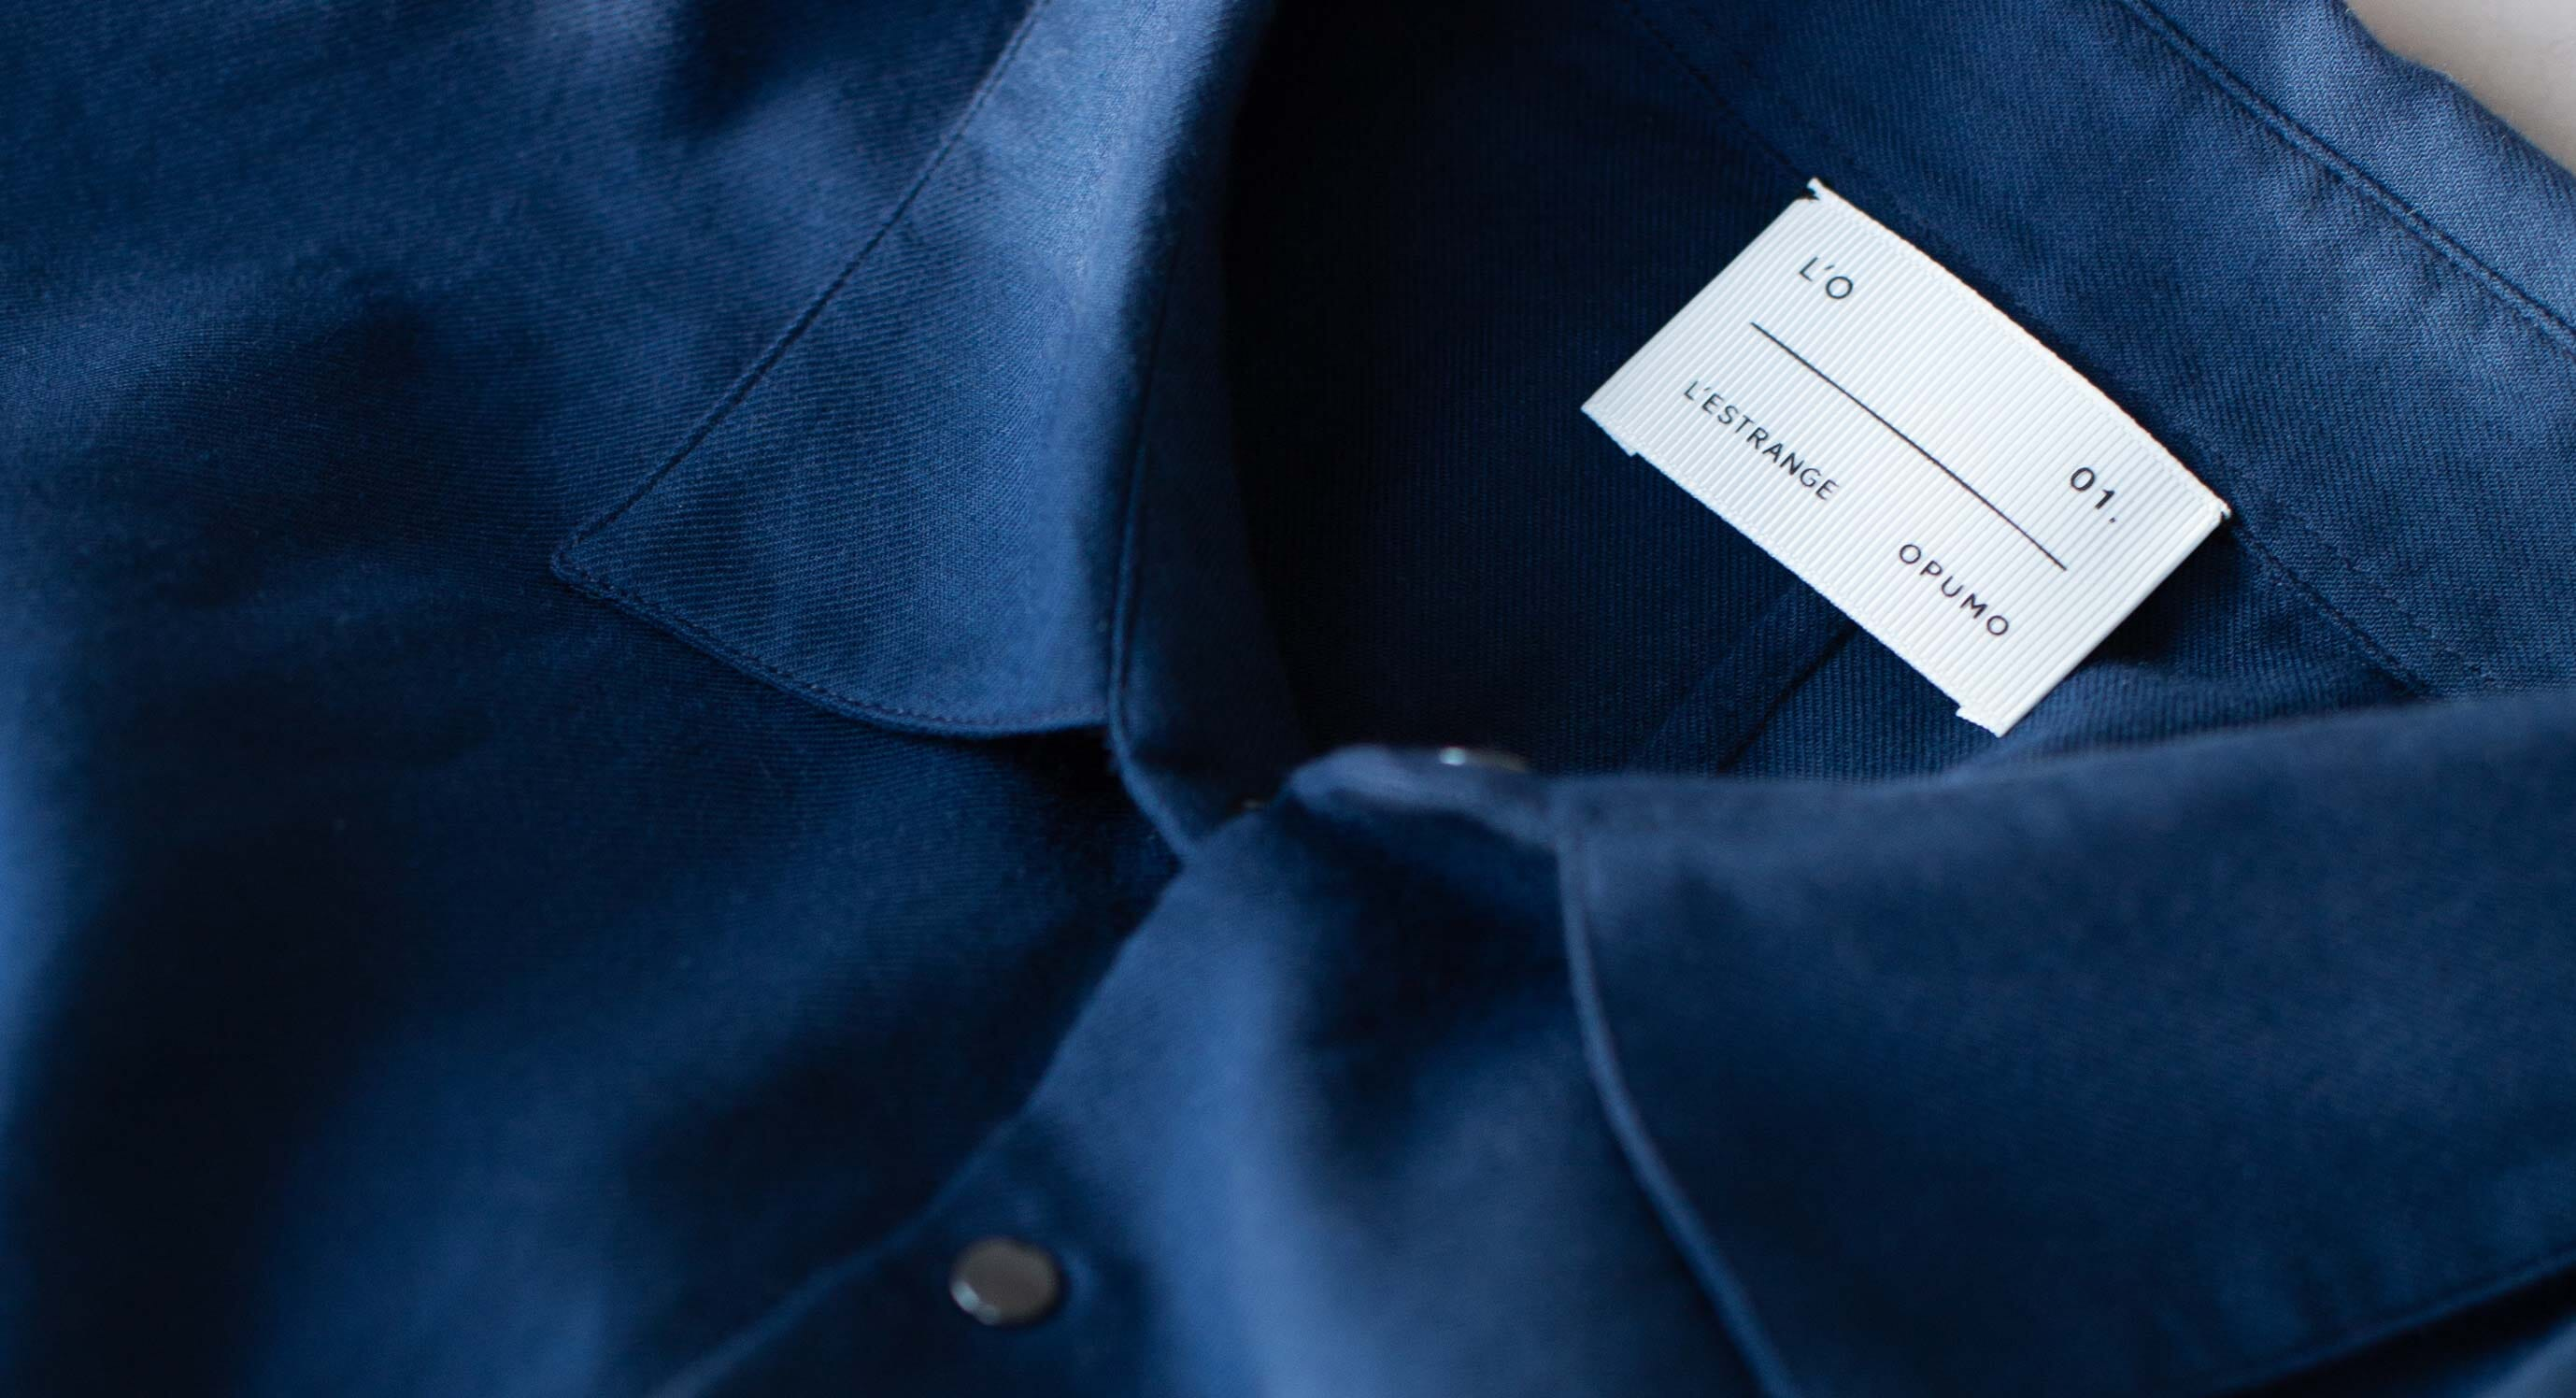 OPUMO x L'Estrange follows Dieter Rams' 10 principles for good design